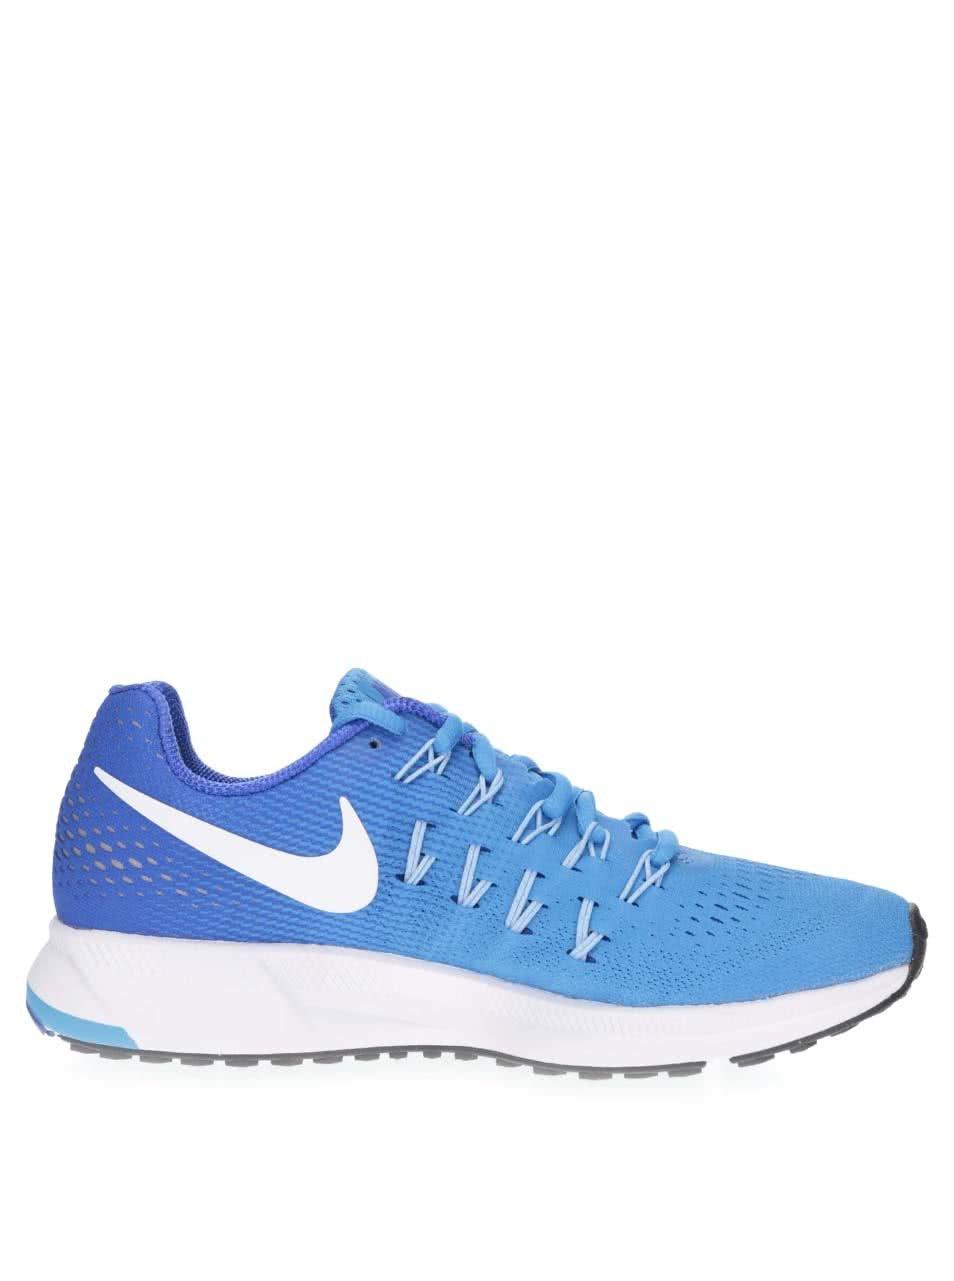 67185c23a1ece Modro-biele dámske tenisky Nike Air Zoom Pegasus 33 | ZOOT.sk